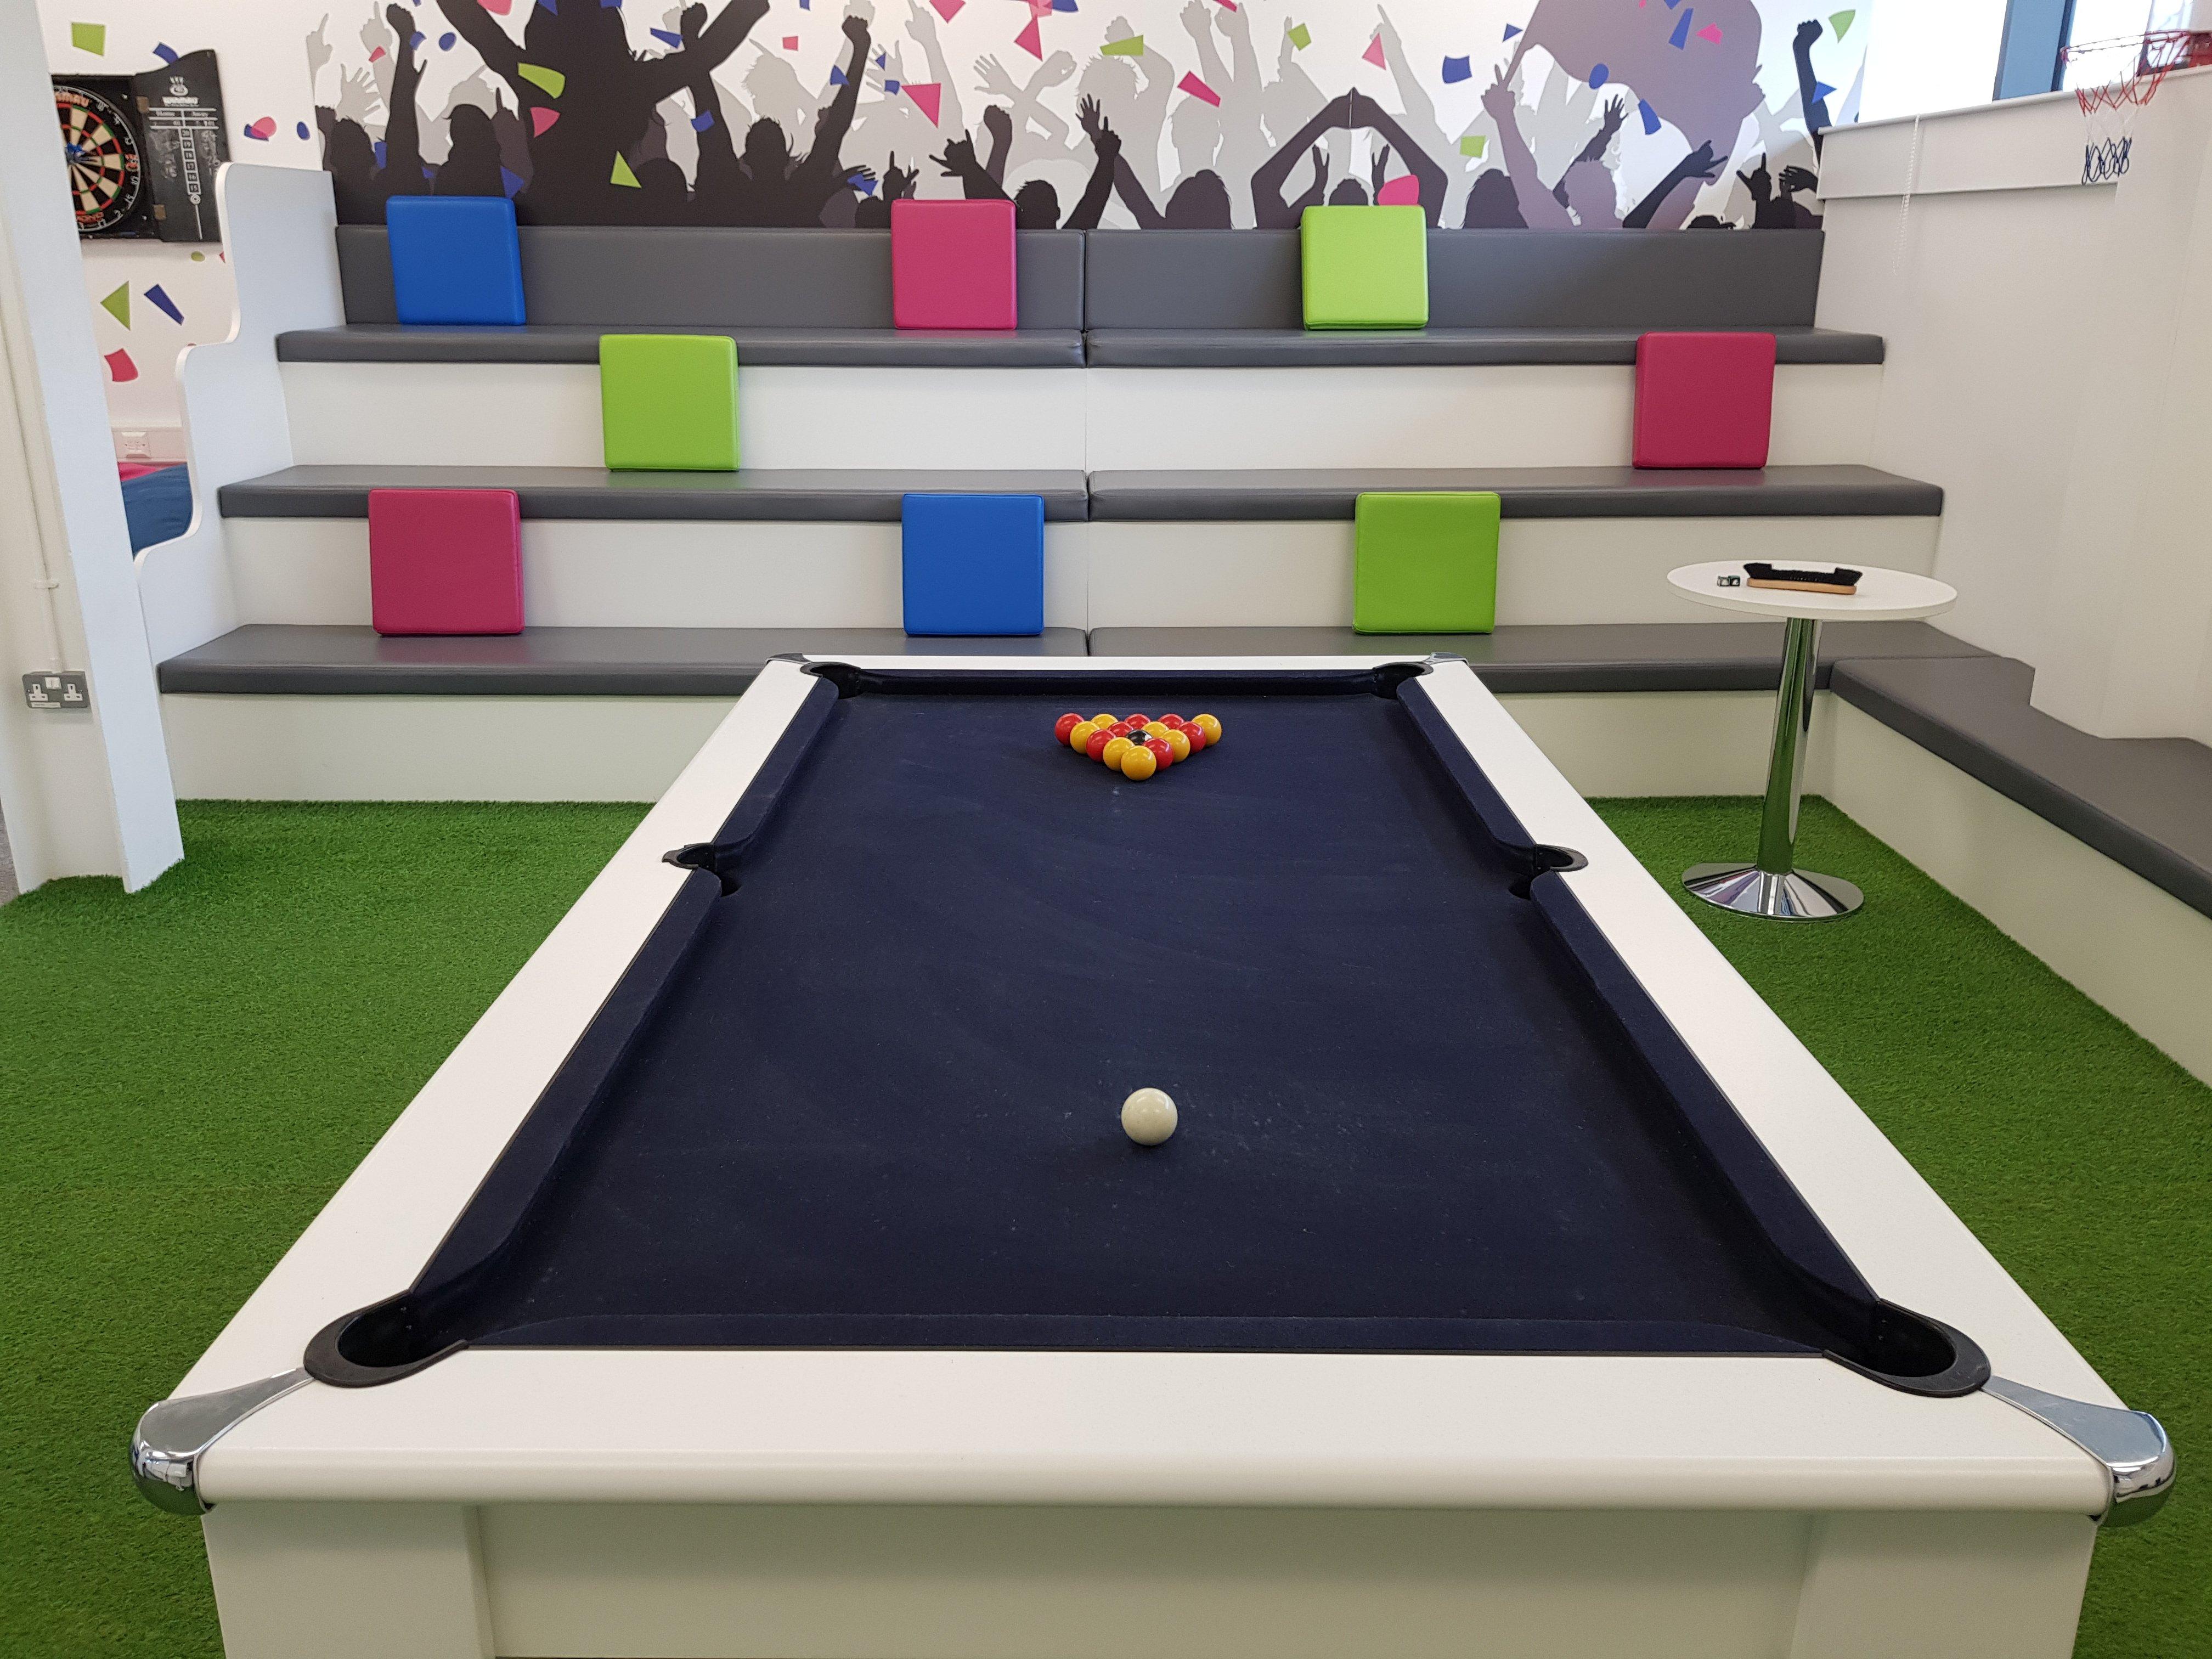 pool table at software company